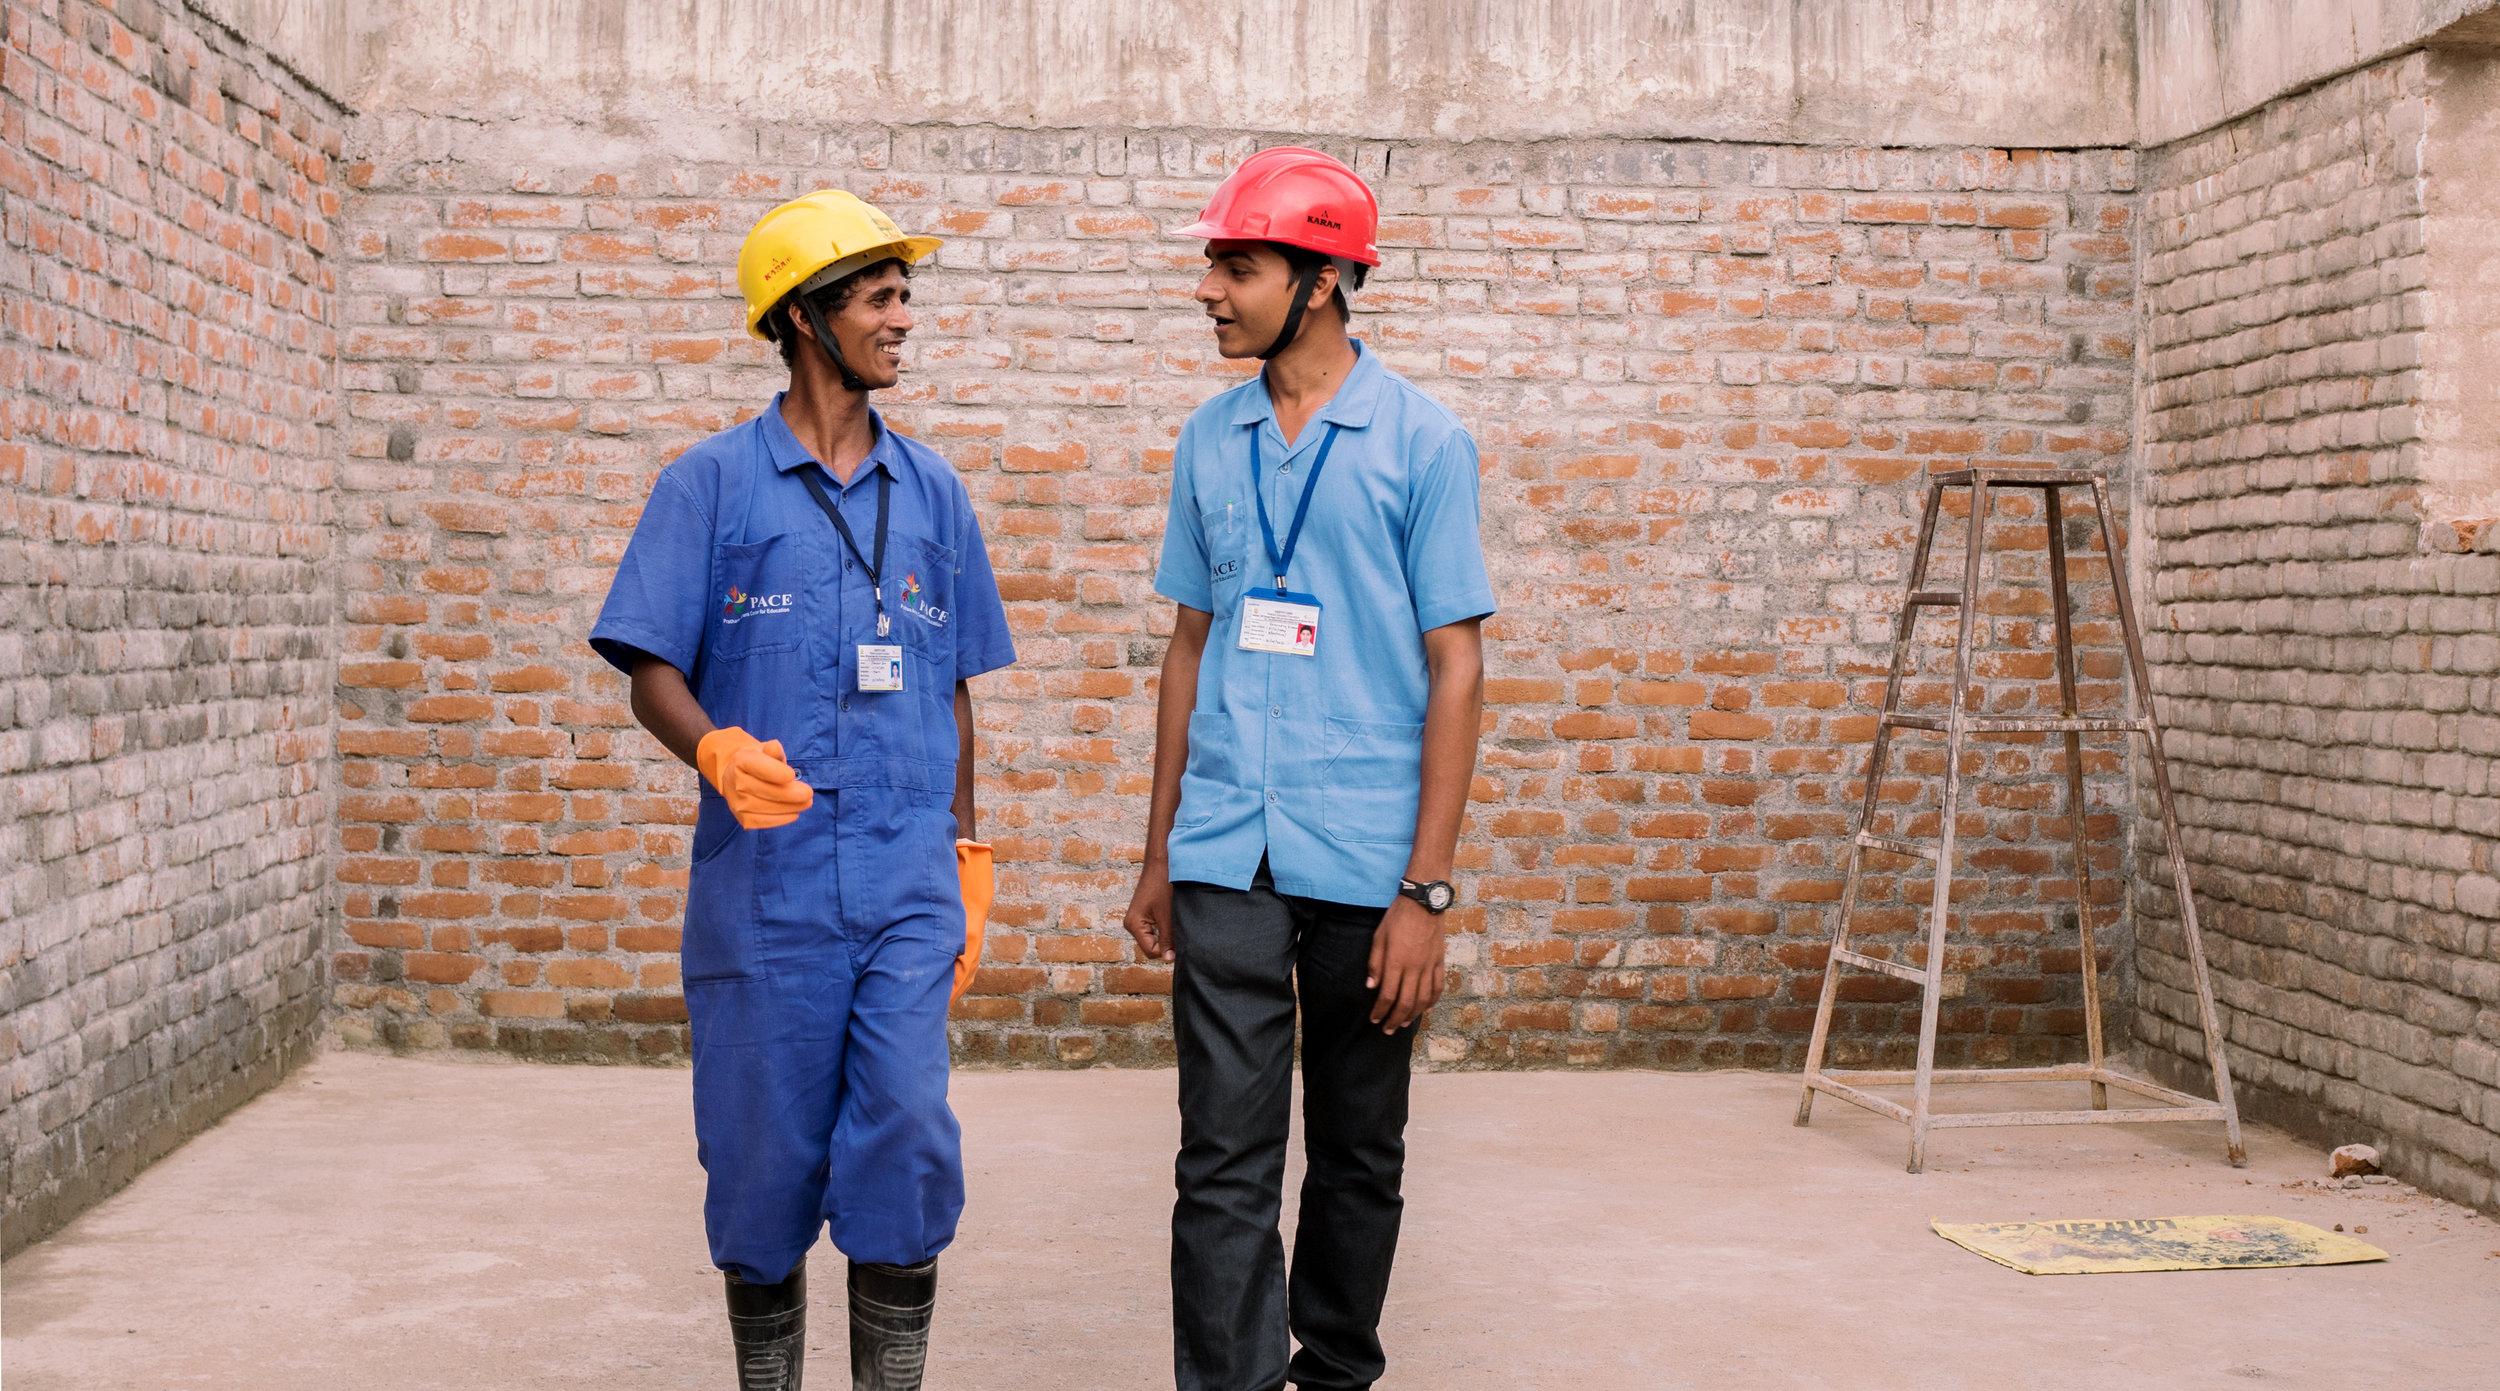 Pratham Institute for Vocational Training - October 2017 - Chhattisgarh